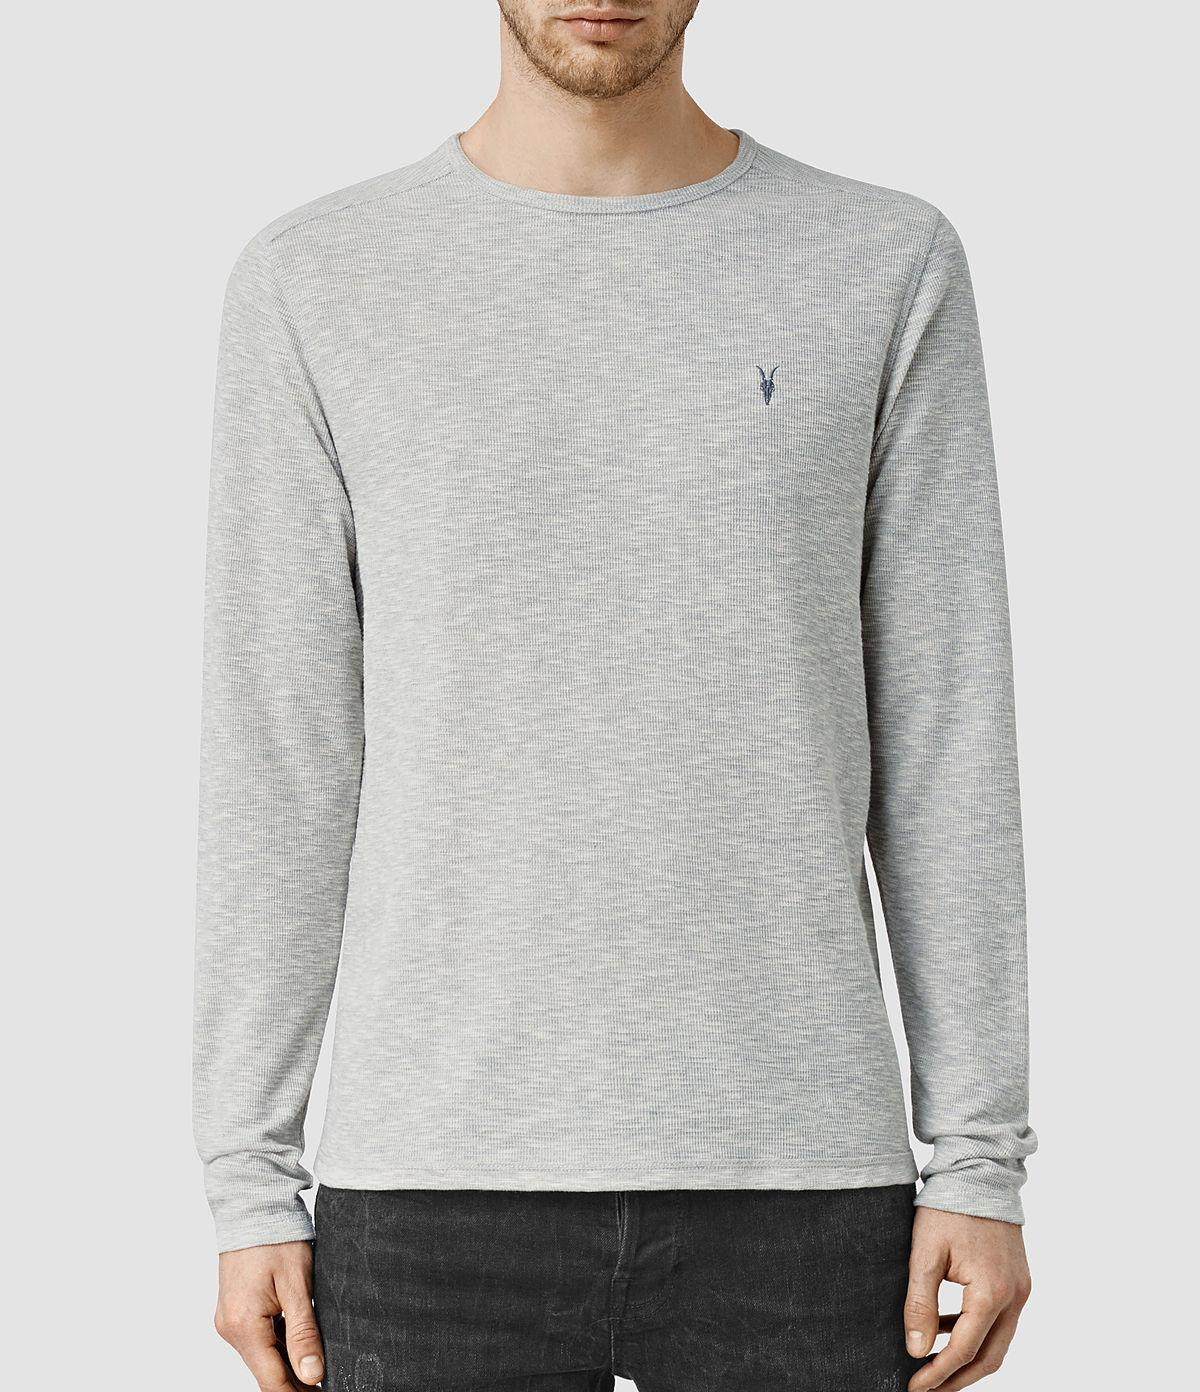 clash-long-sleeve-crew-t-shirt